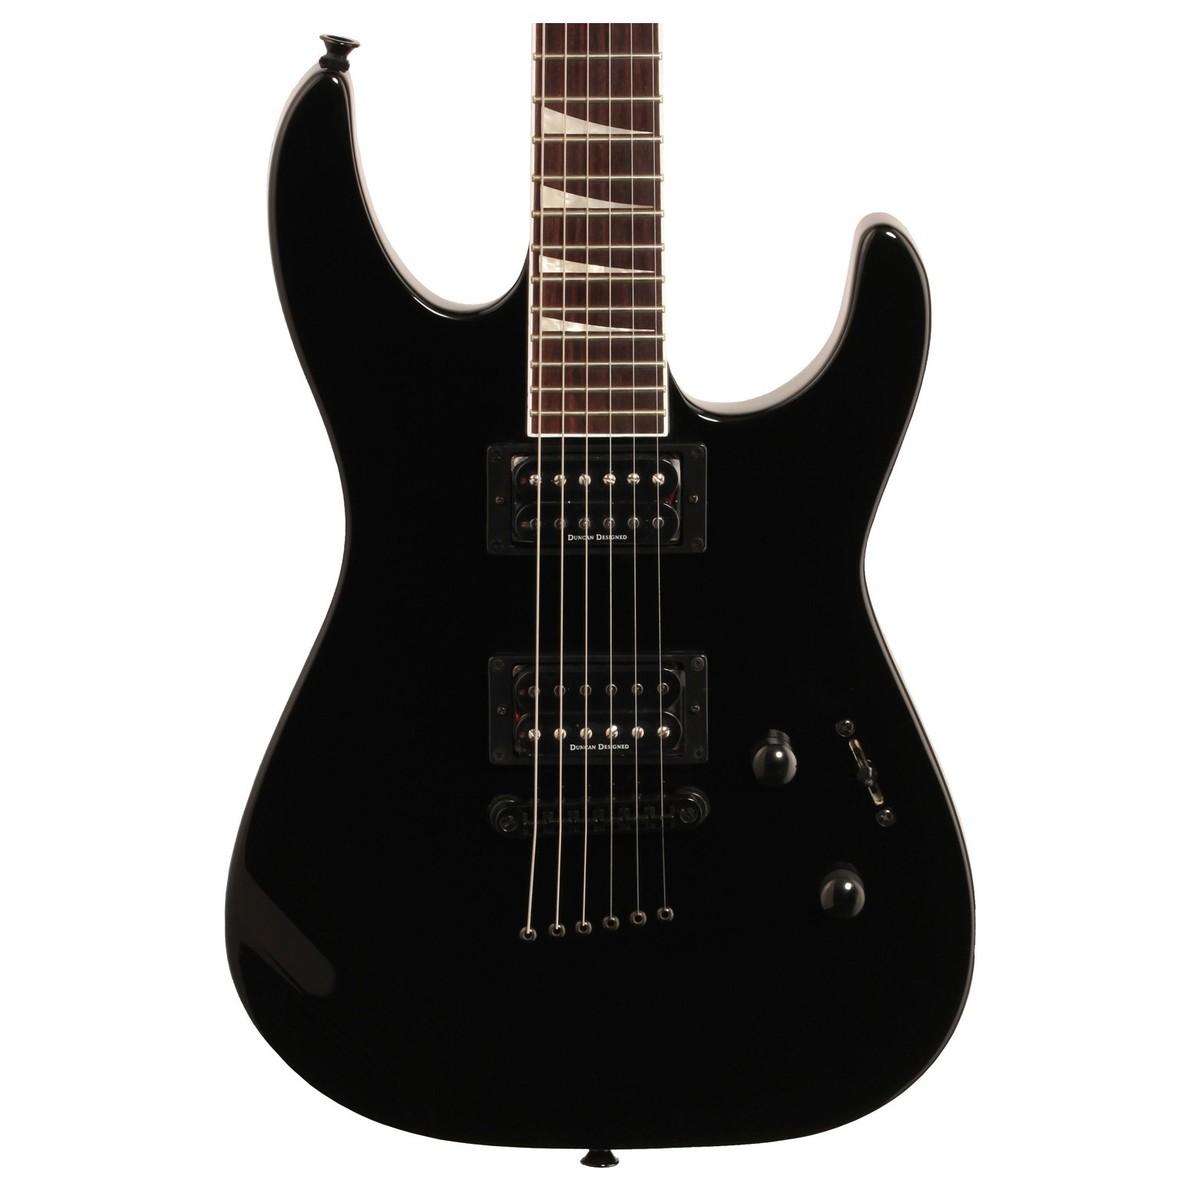 jackson x series soloist slxt electric guitar gloss black at. Black Bedroom Furniture Sets. Home Design Ideas